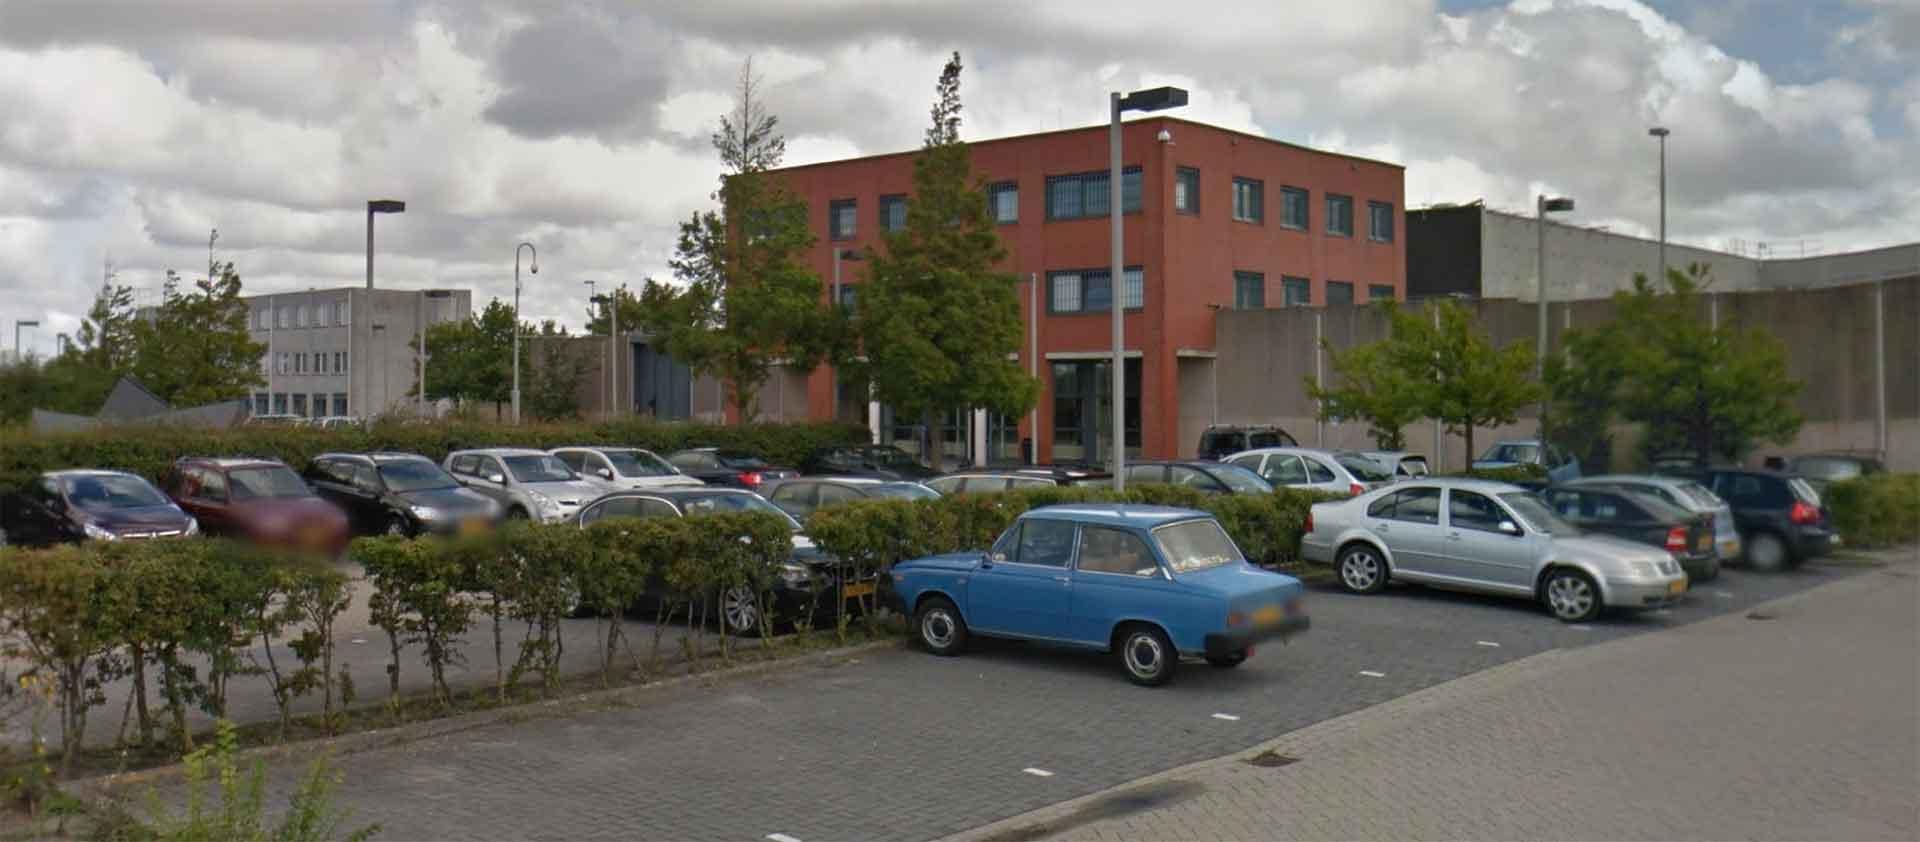 Penitentiaire Inrichting PI Middelburg - Weening Strafrechtadvocaten